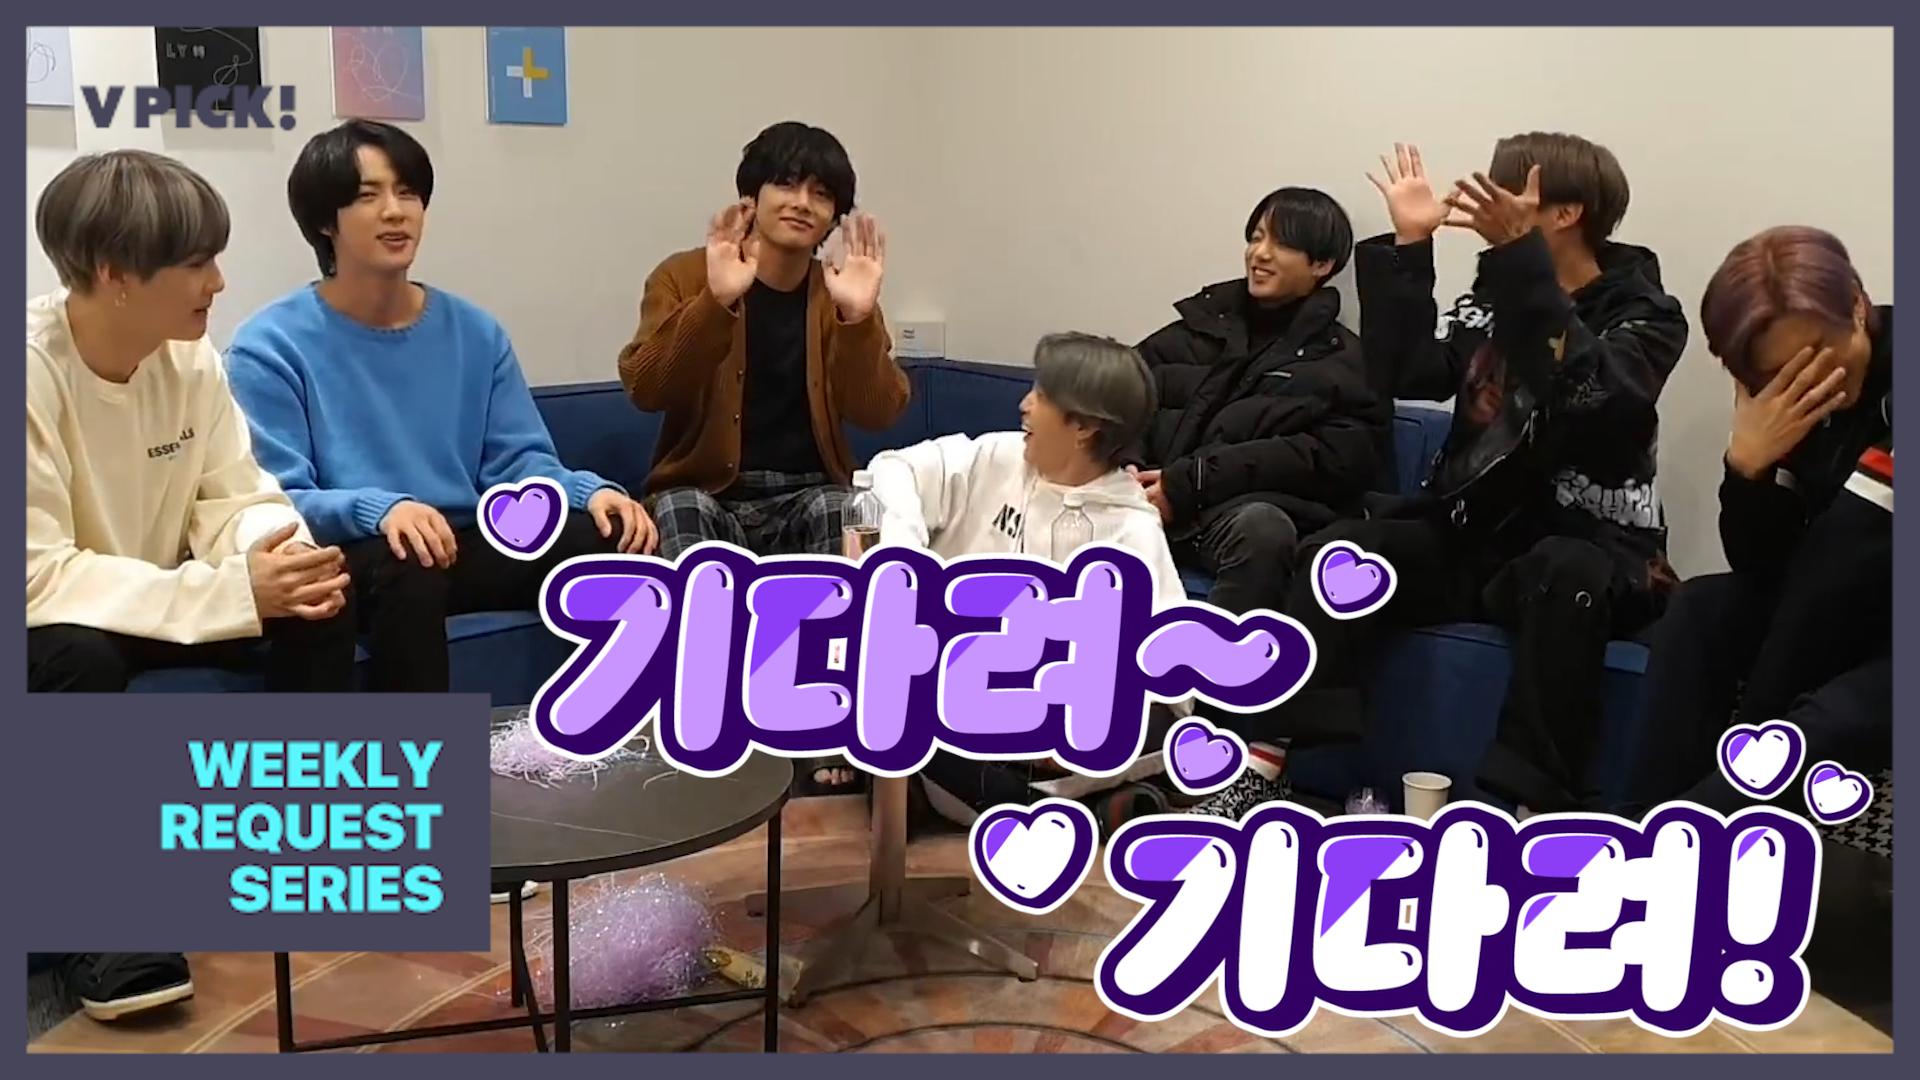 [BTS] 울 탄이들 가둘 사랑감옥 만들어줄라니까 기다려~ 기다려~!٩(ᐛ)و💜 (BTS talking about 7 favorite things)